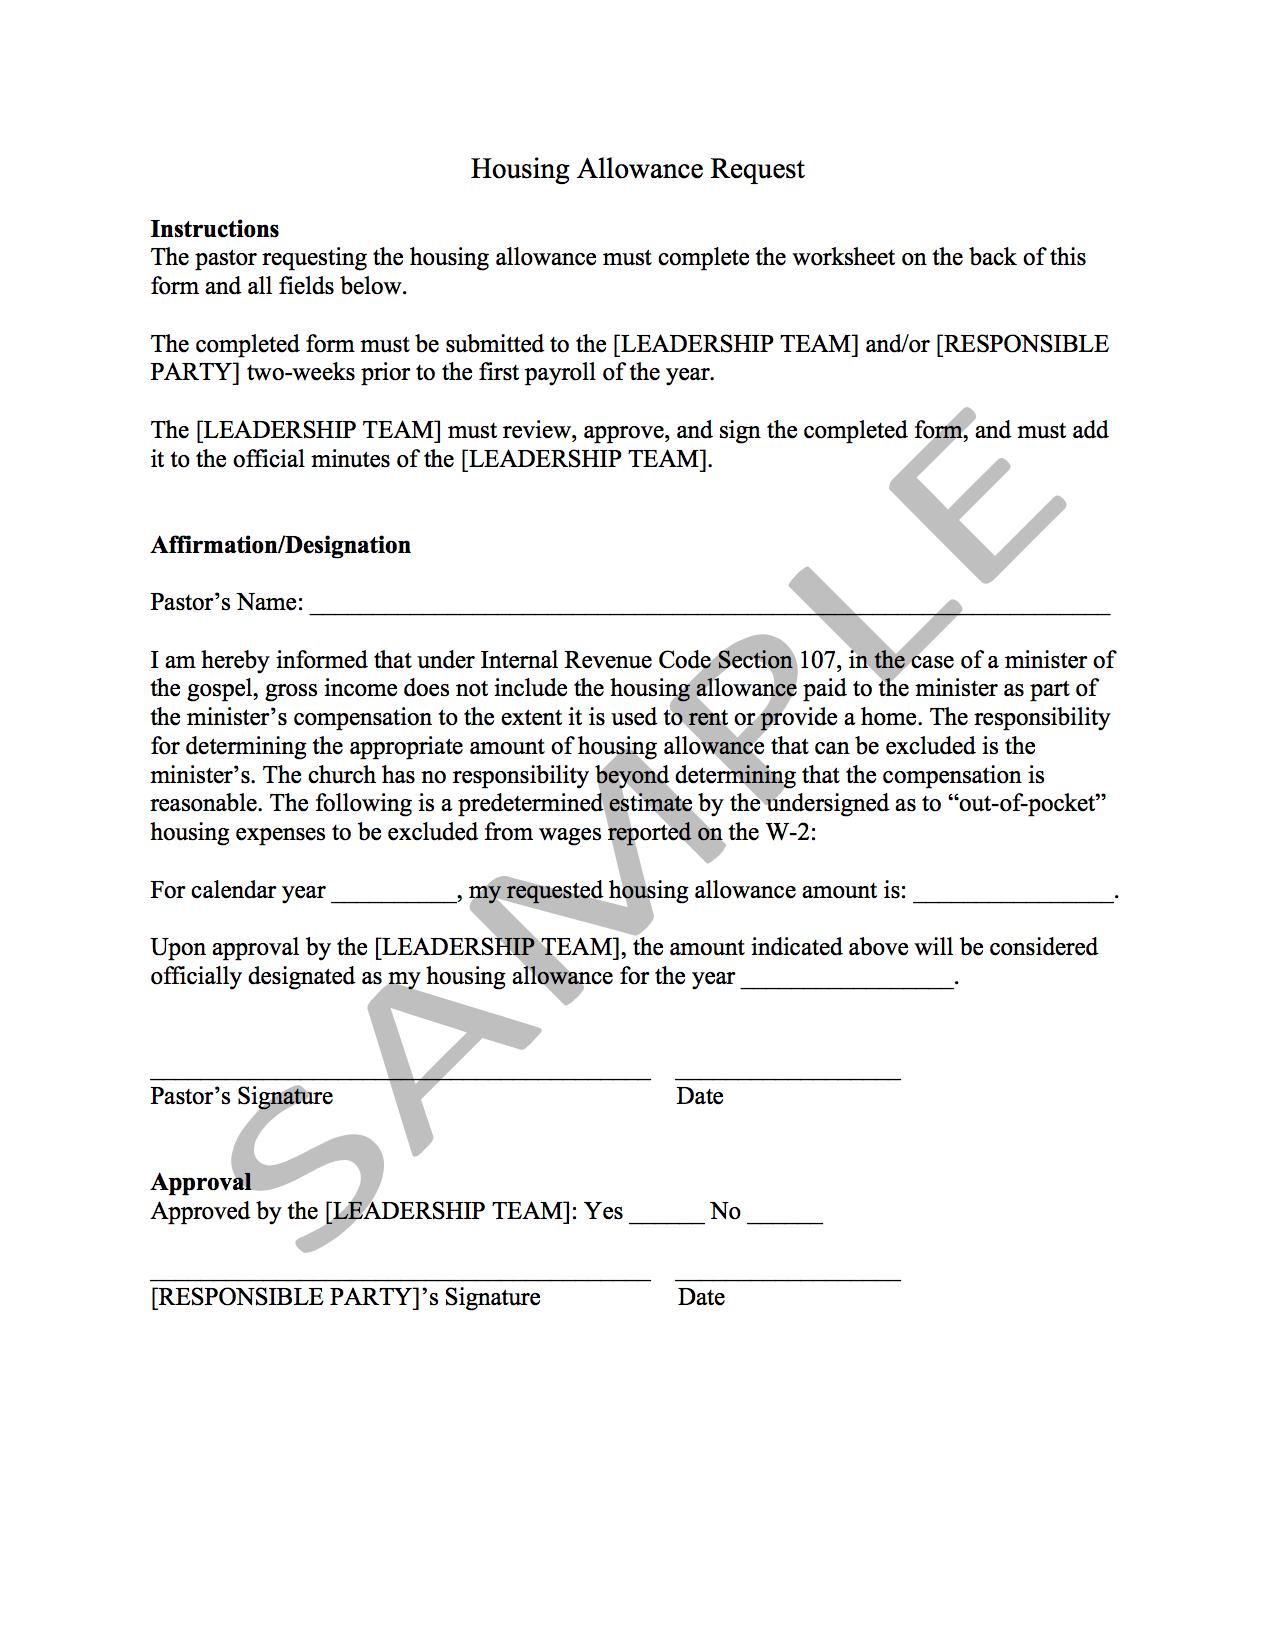 Housing Allowance Request - SAMPLE IMAGE.jpg